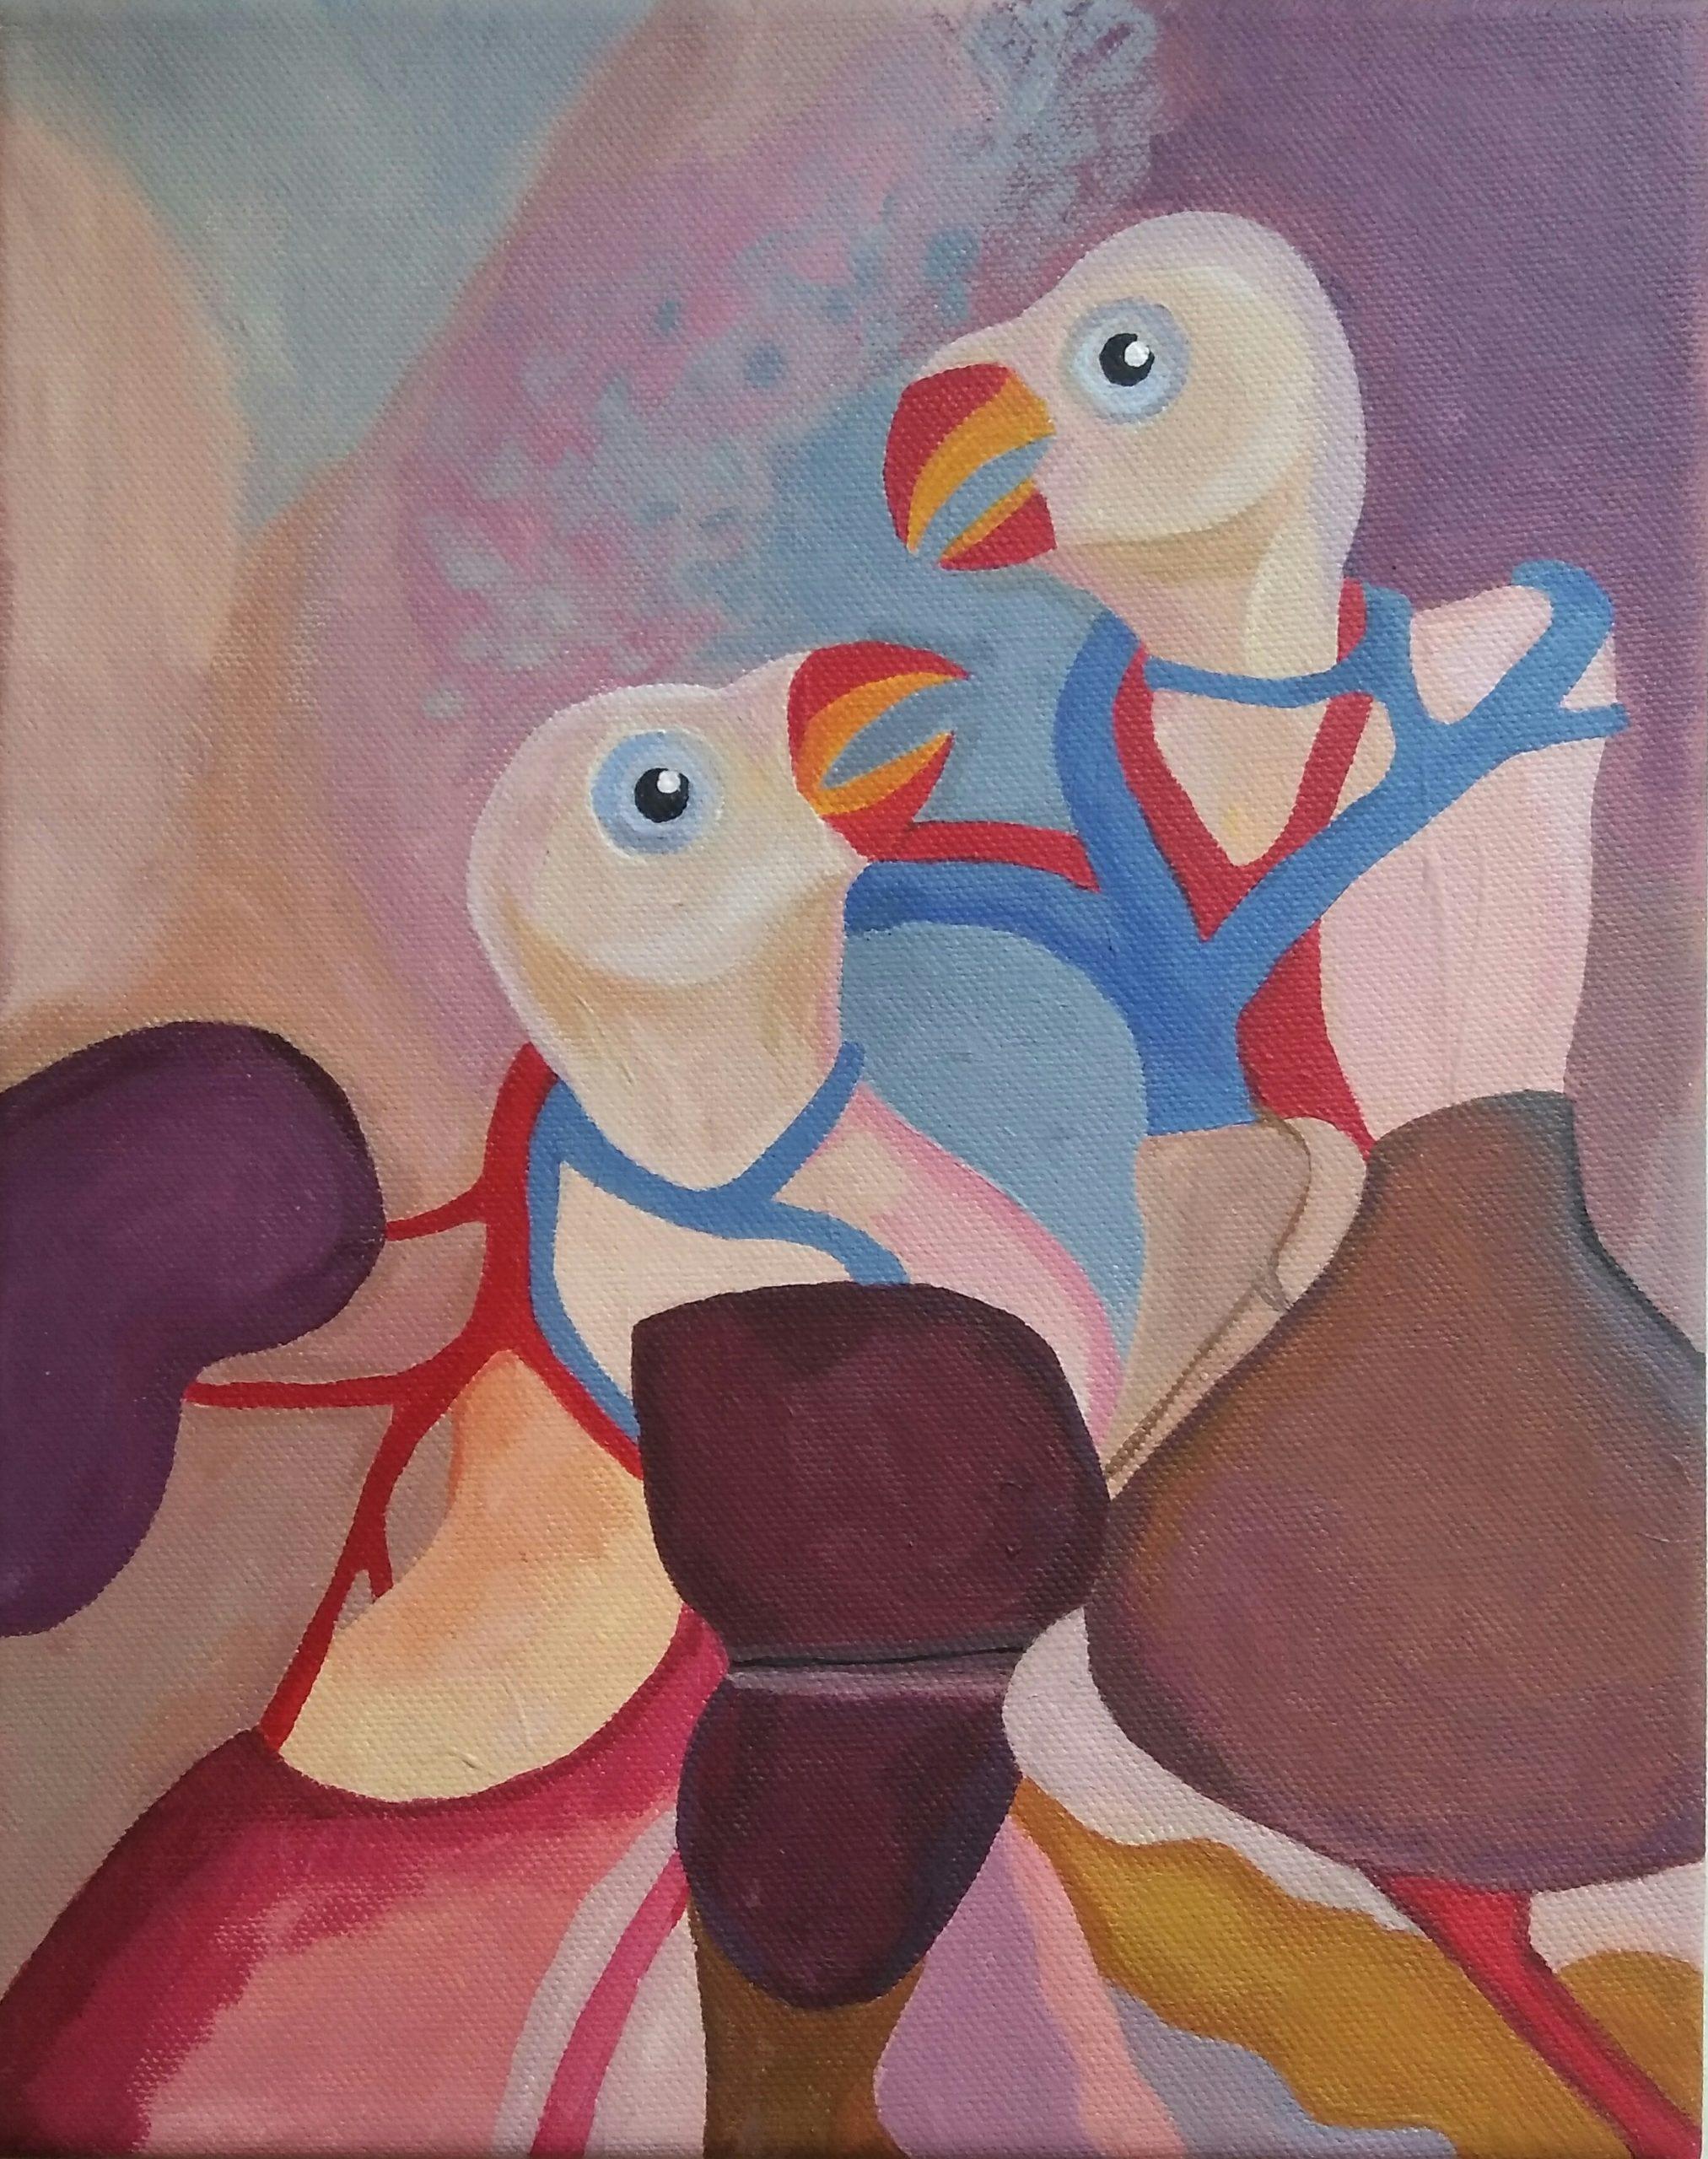 KNH-Tiny Gallery #7: Dorothea Prem